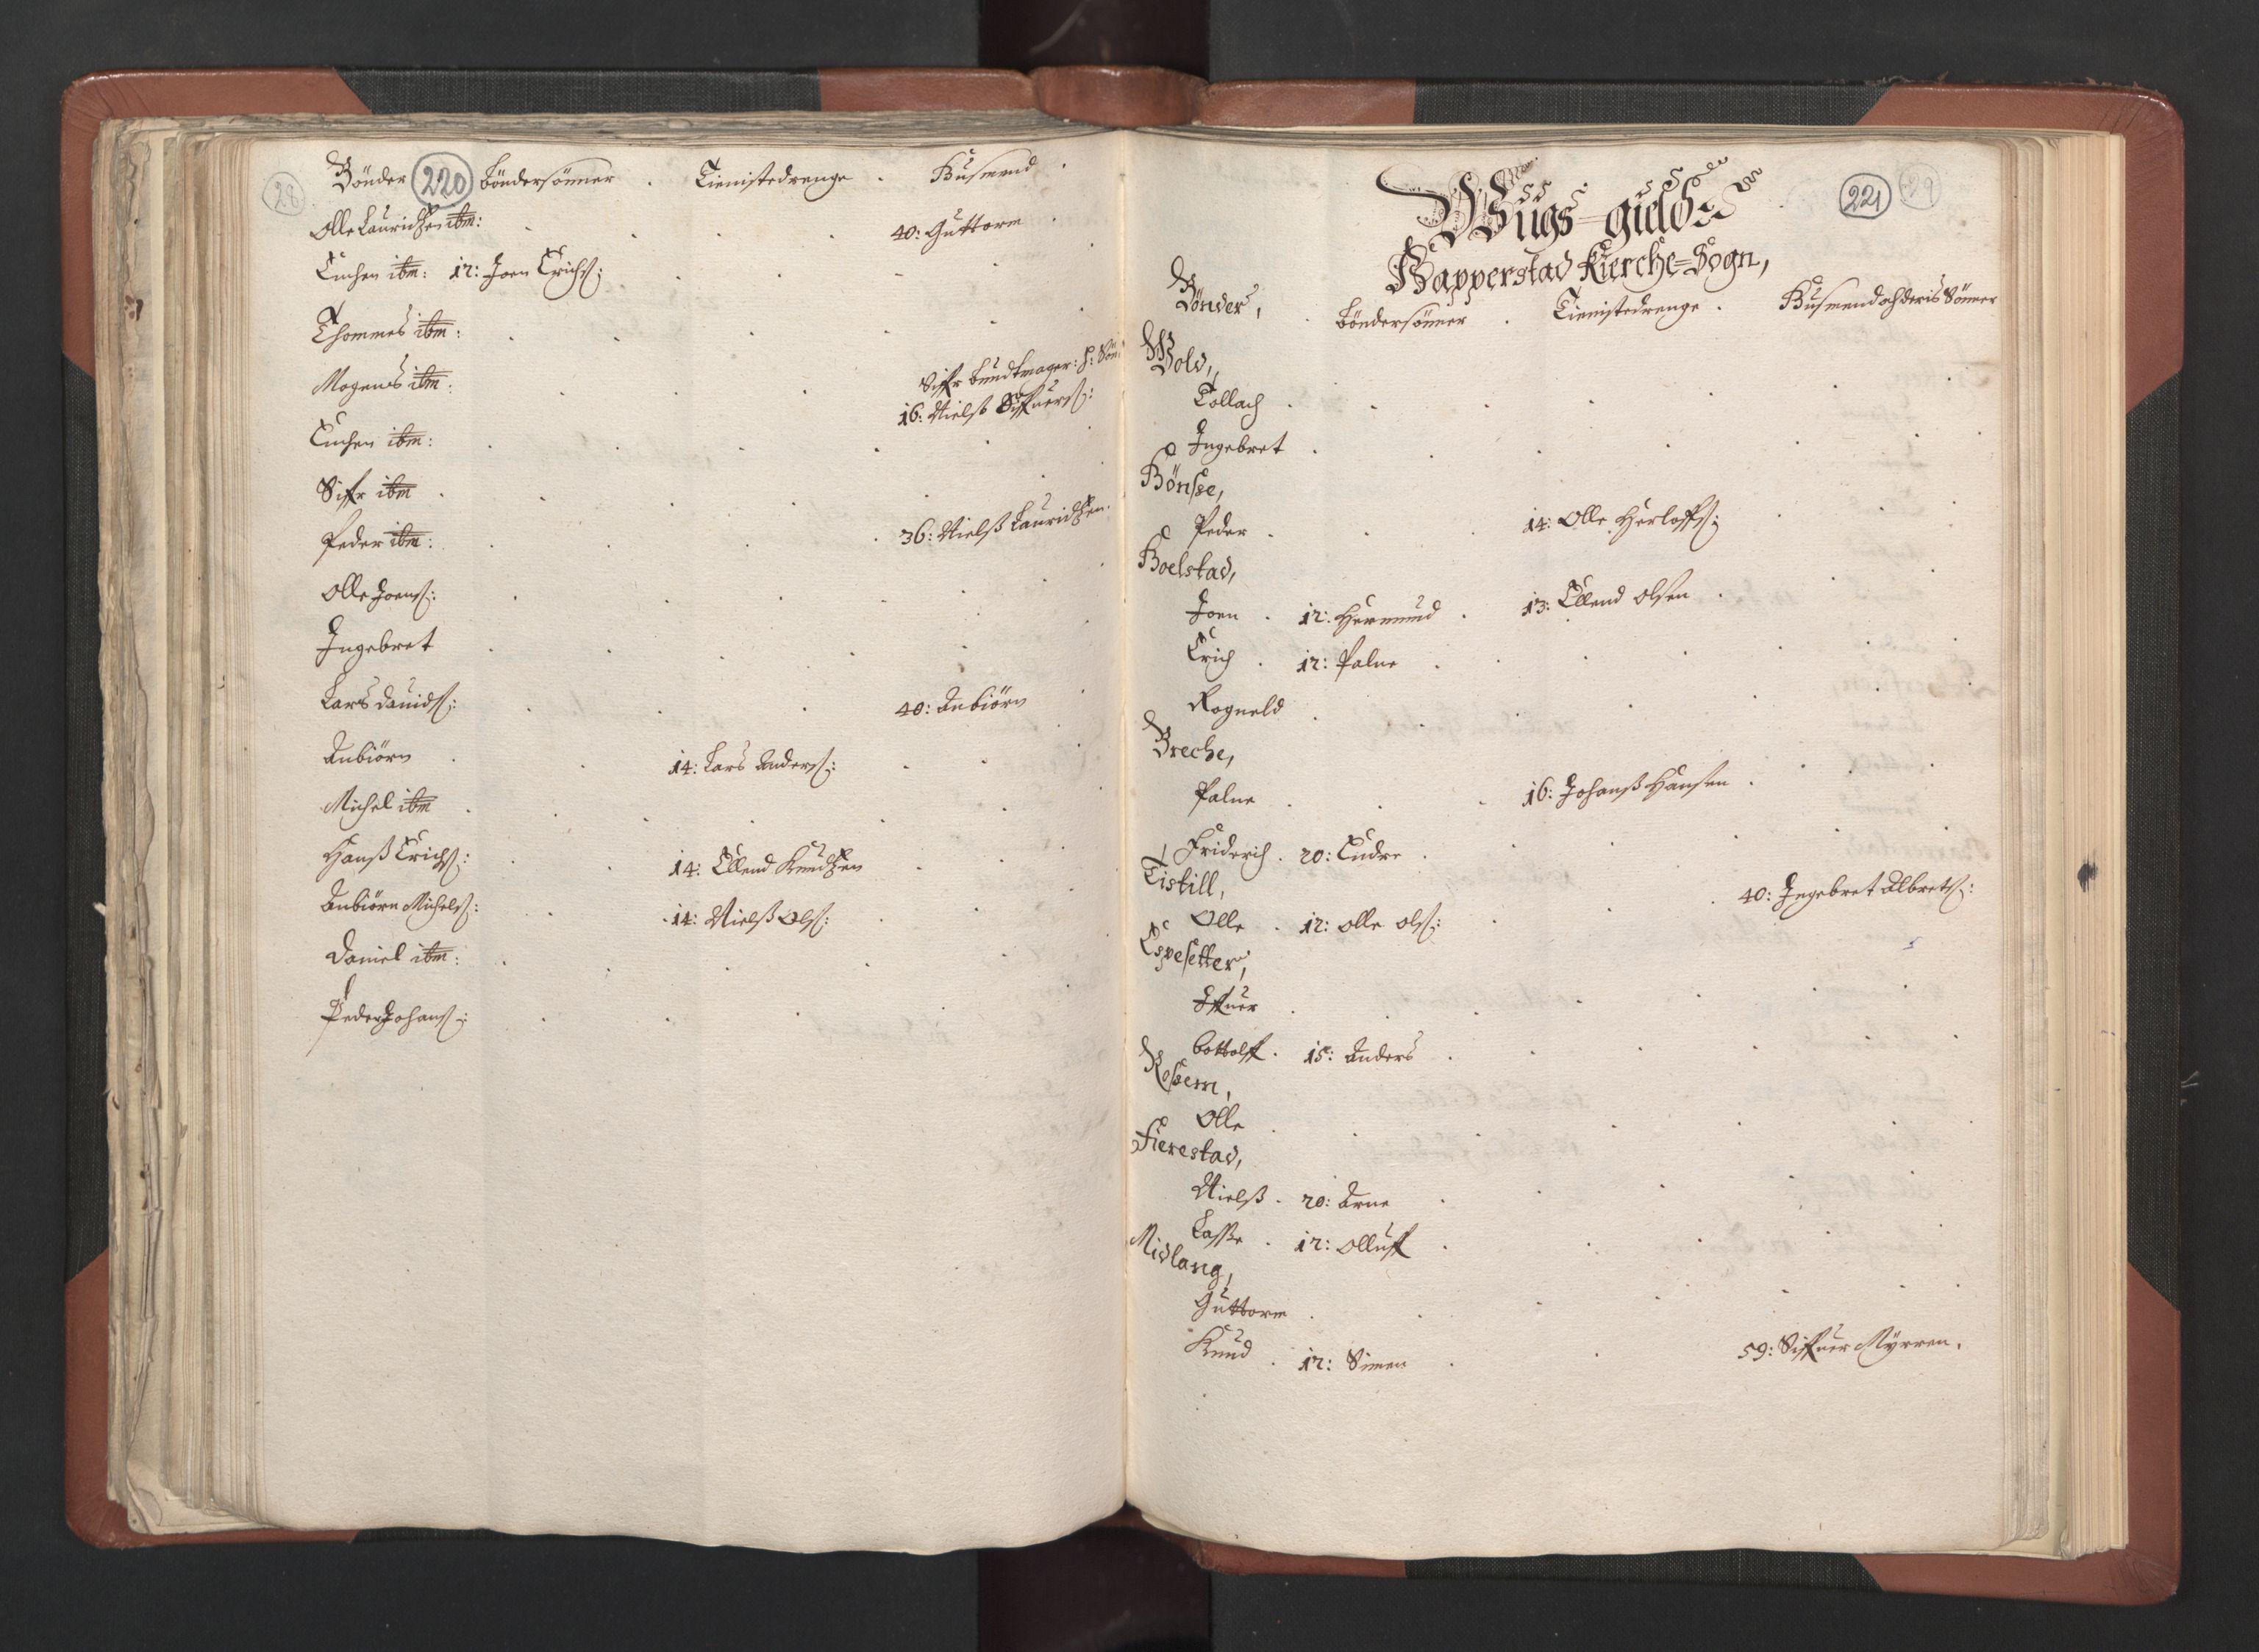 RA, Fogdenes og sorenskrivernes manntall 1664-1666, nr. 14: Hardanger len, Ytre Sogn fogderi og Indre Sogn fogderi, 1664-1665, s. 220-221